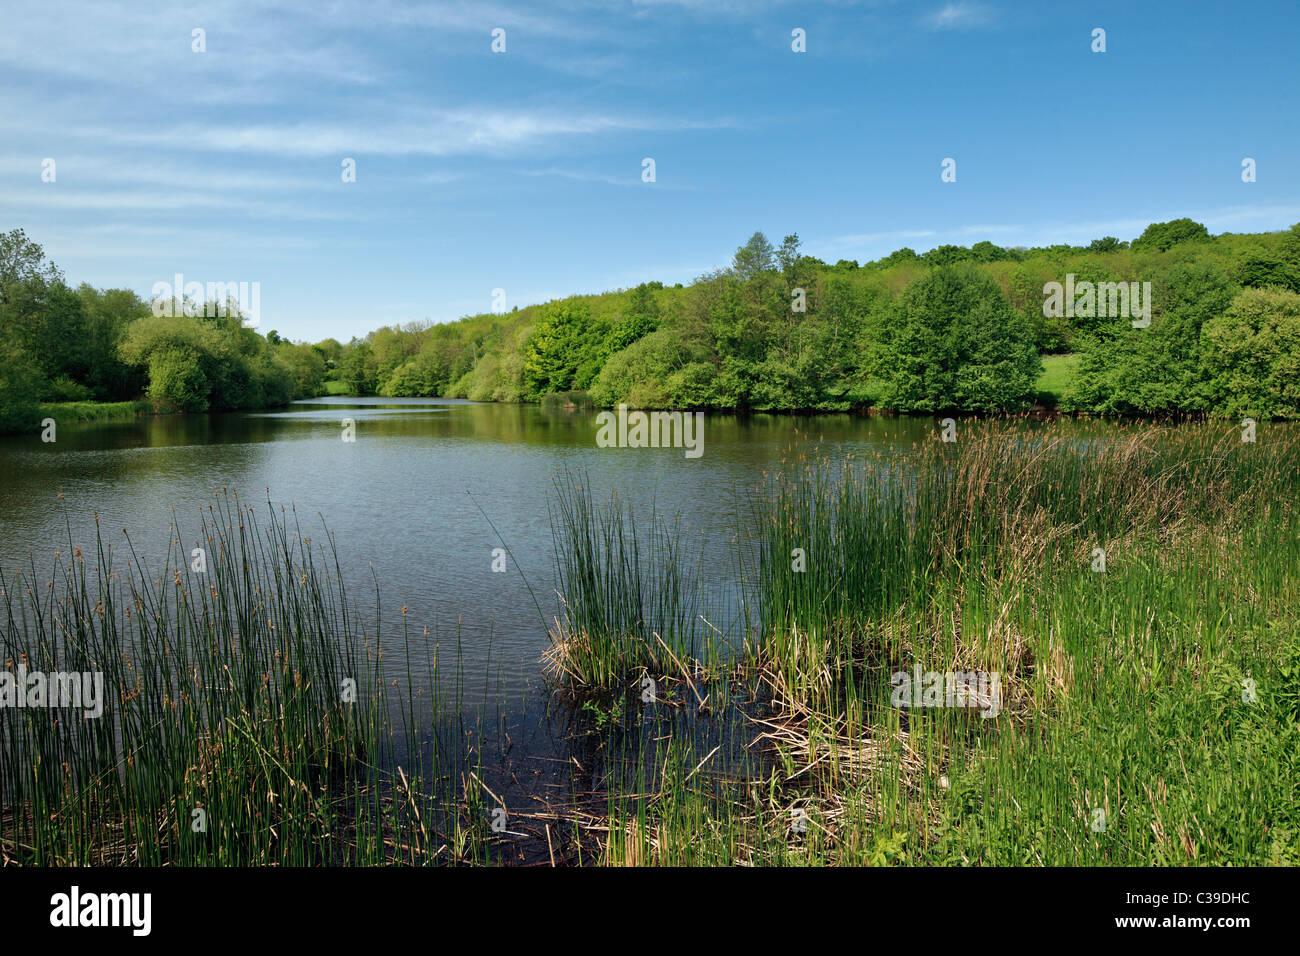 Picturesque lake near Tenterden, Kent. - Stock Image